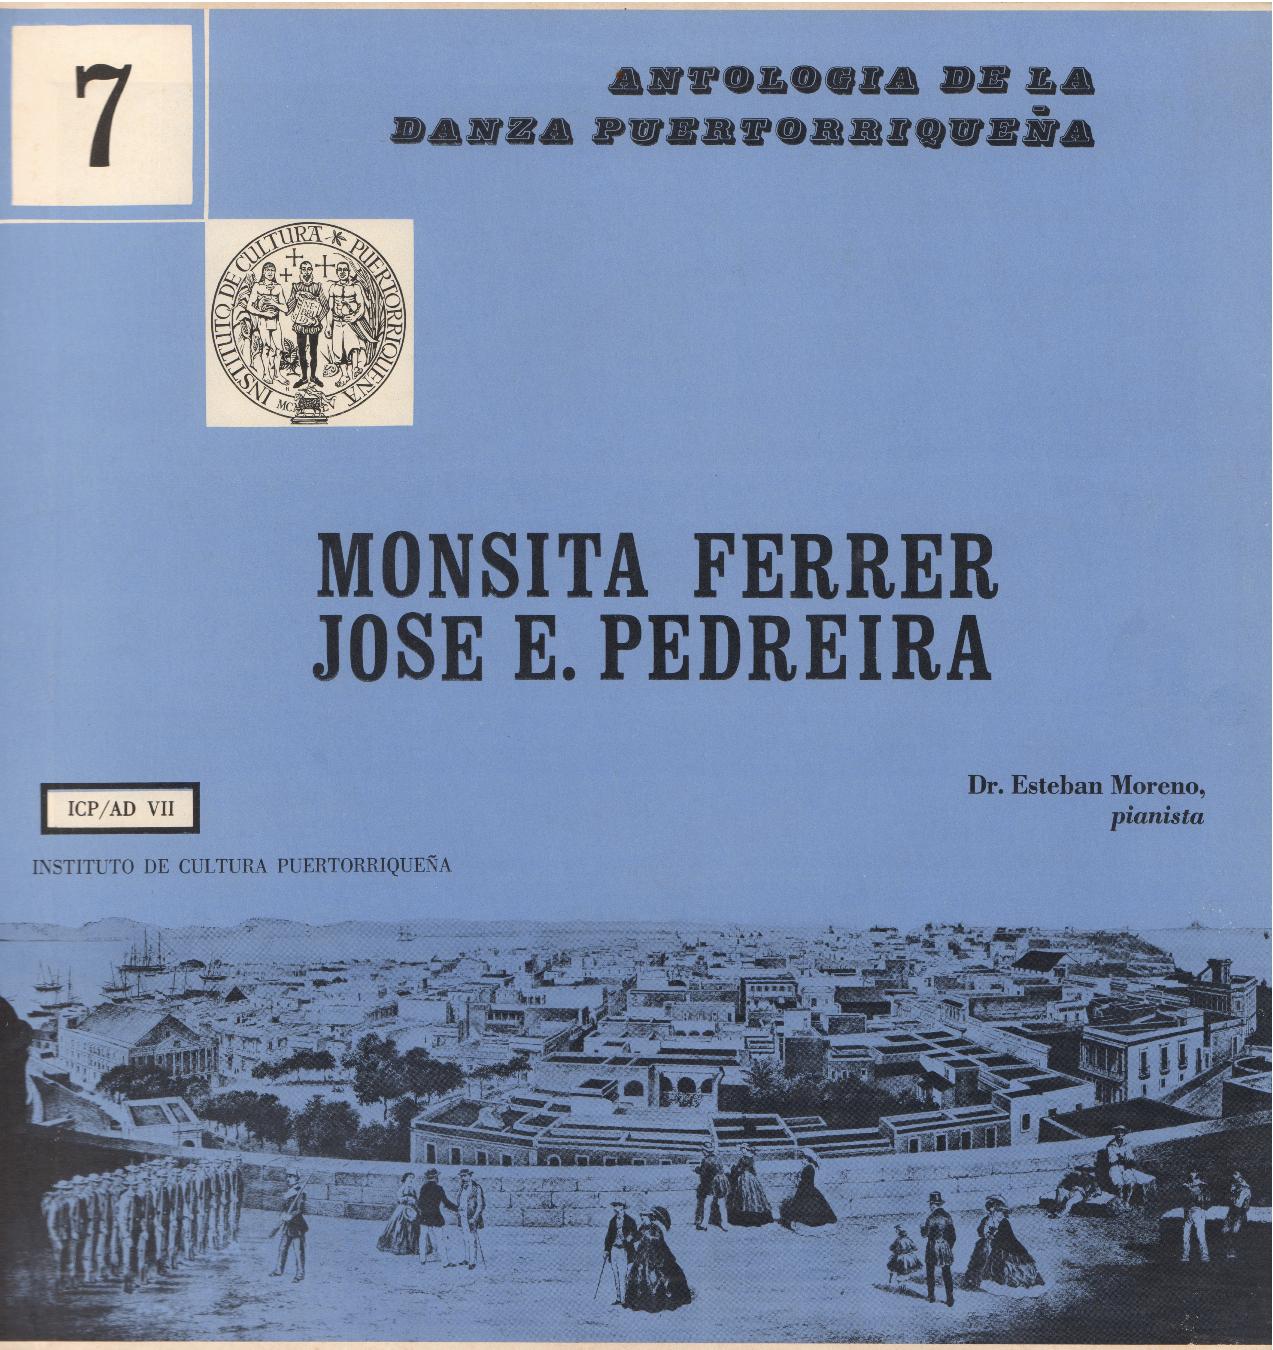 Danzas de Monsita Ferrer y José E. Pedreira